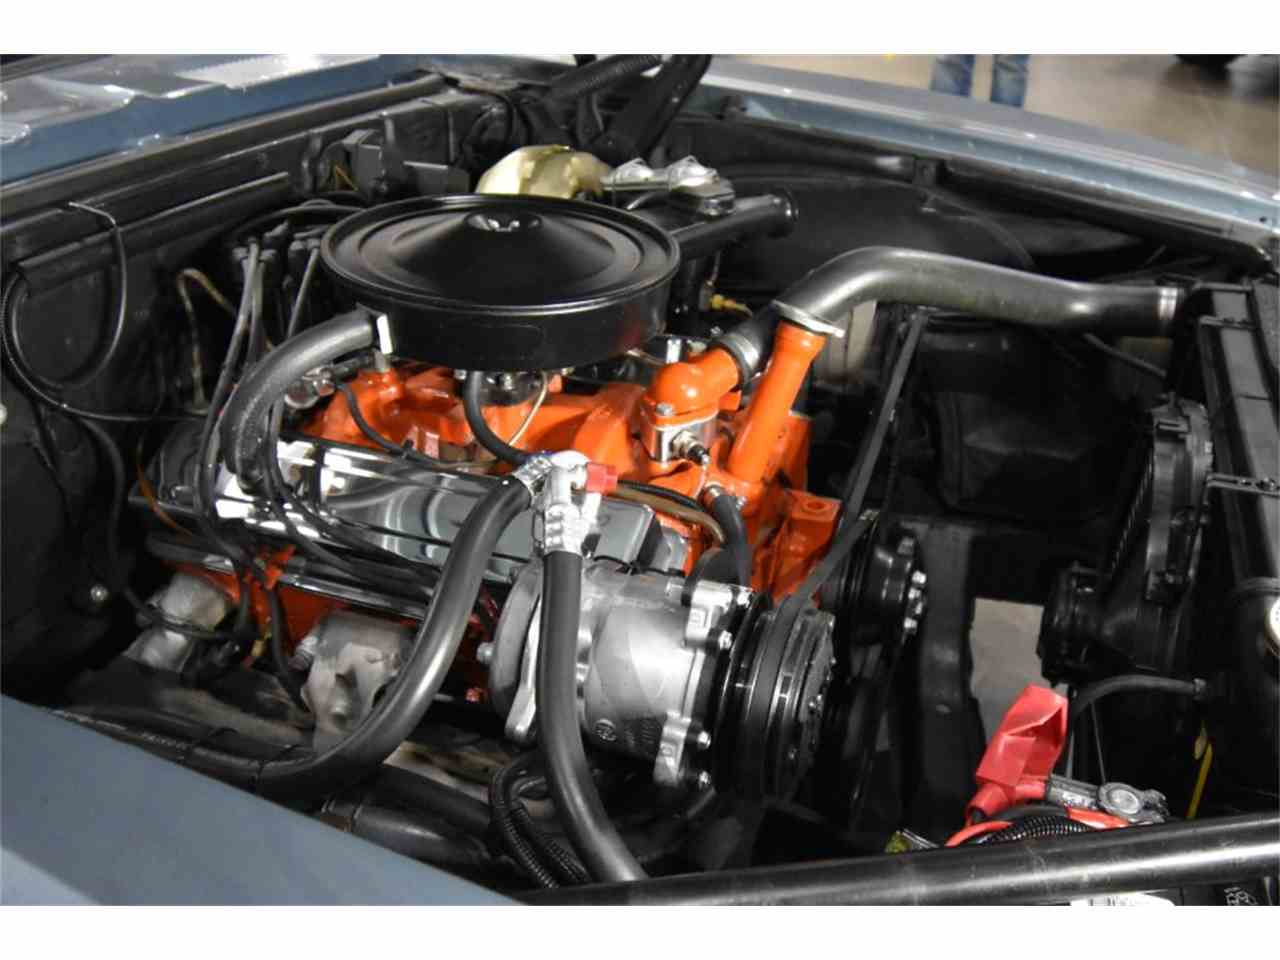 Large Picture of '68 Camaro located in California - $47,900.00 - MO9U